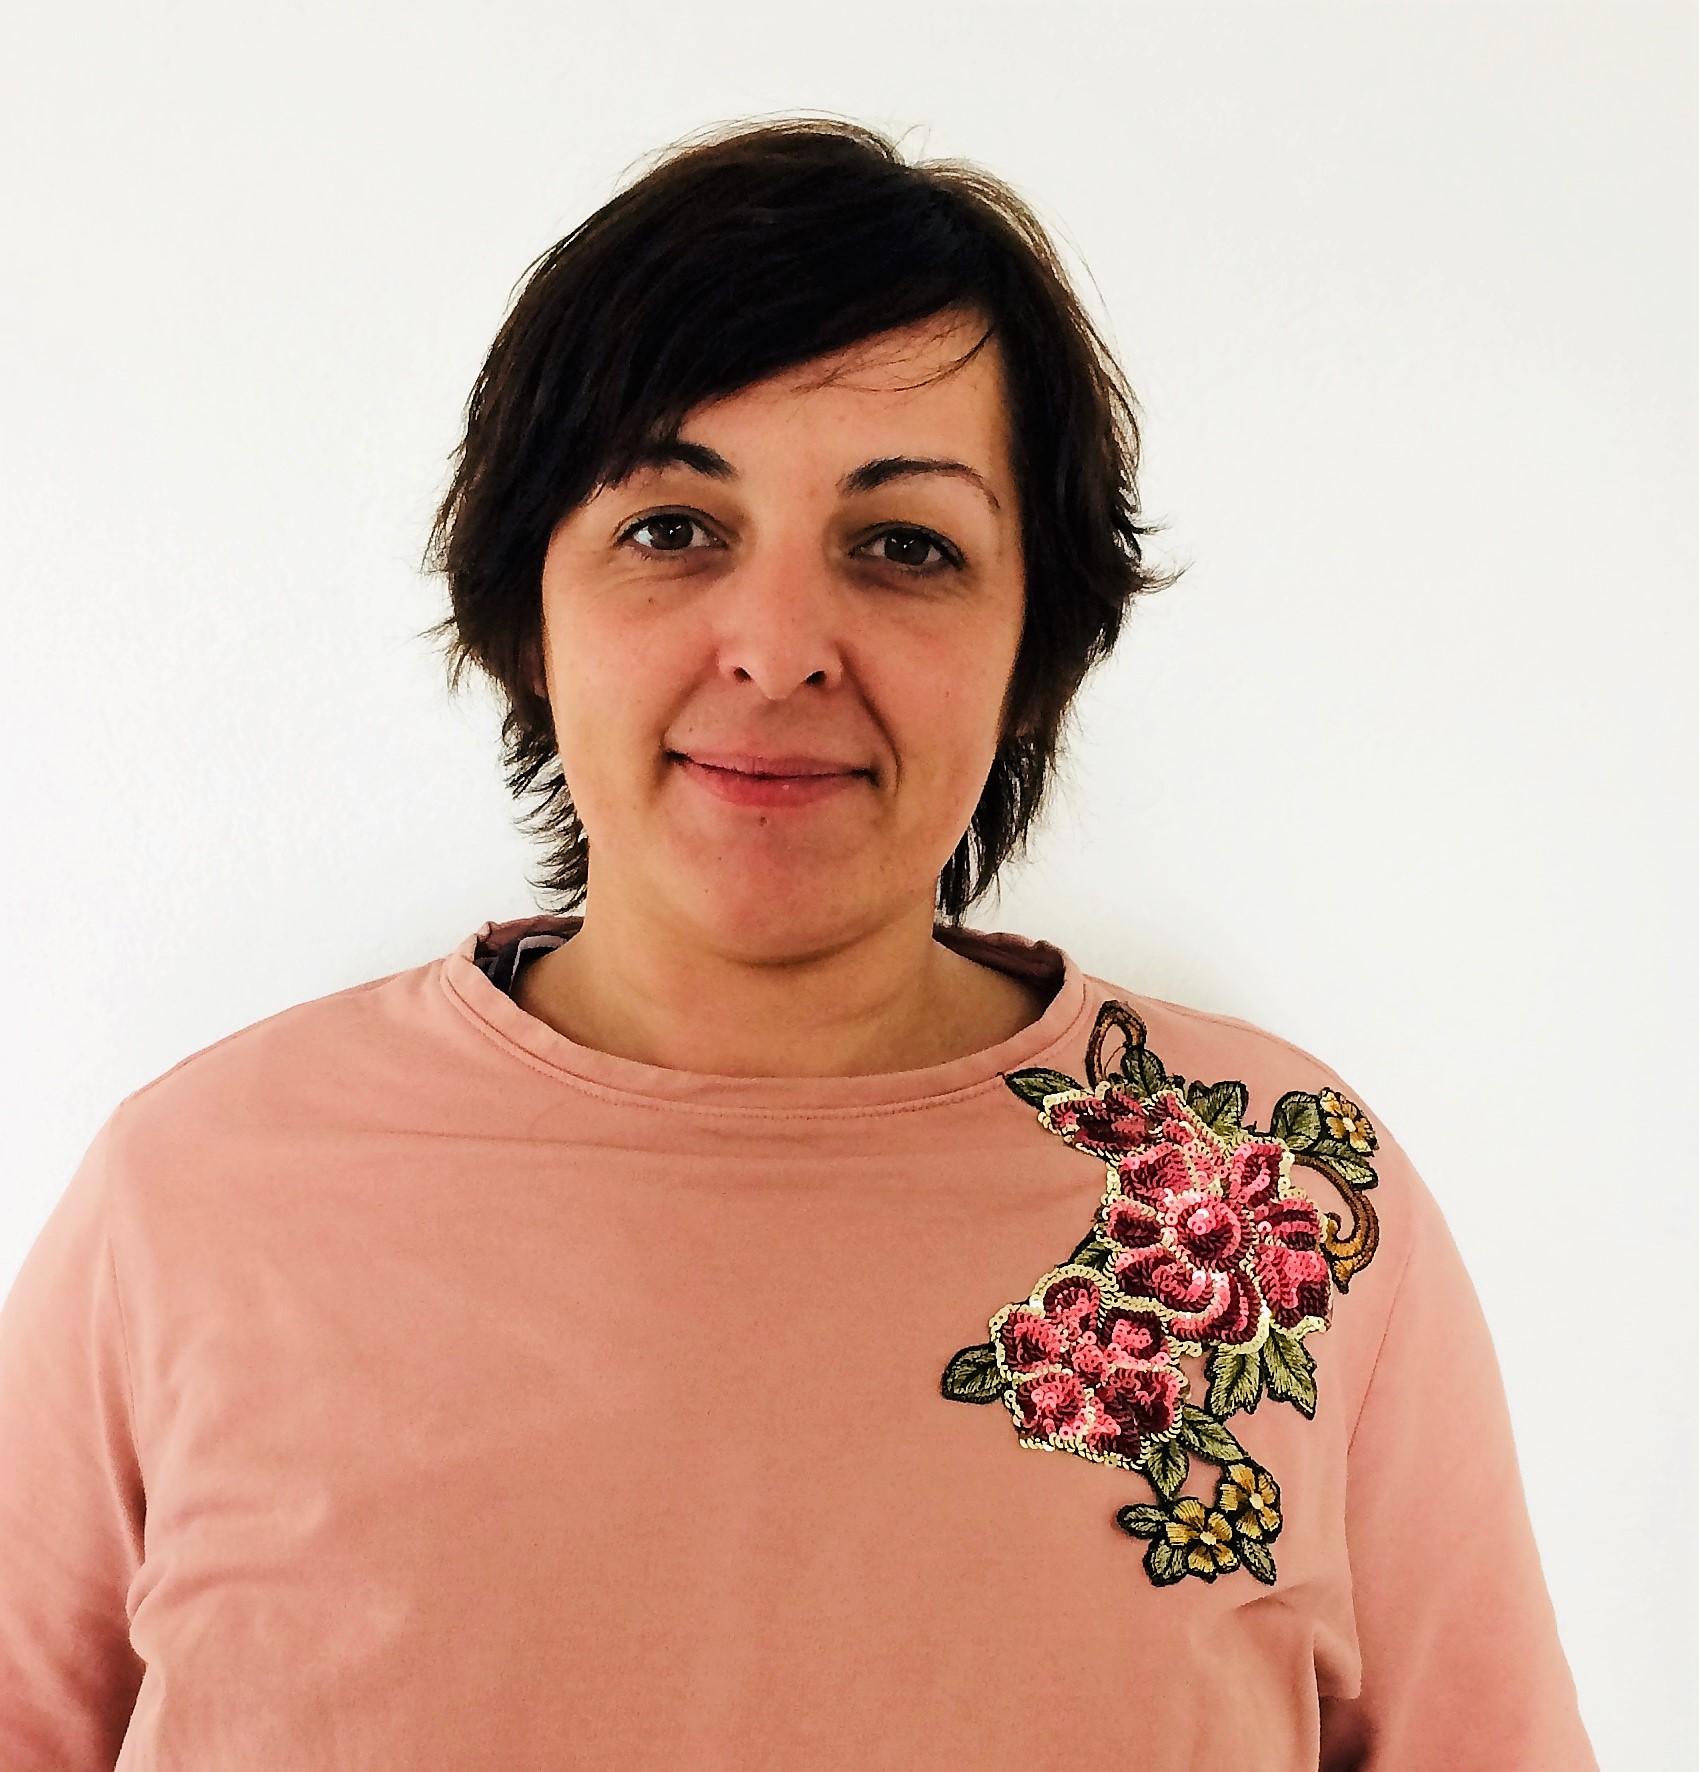 Melanie-Directora-Villas-Coll